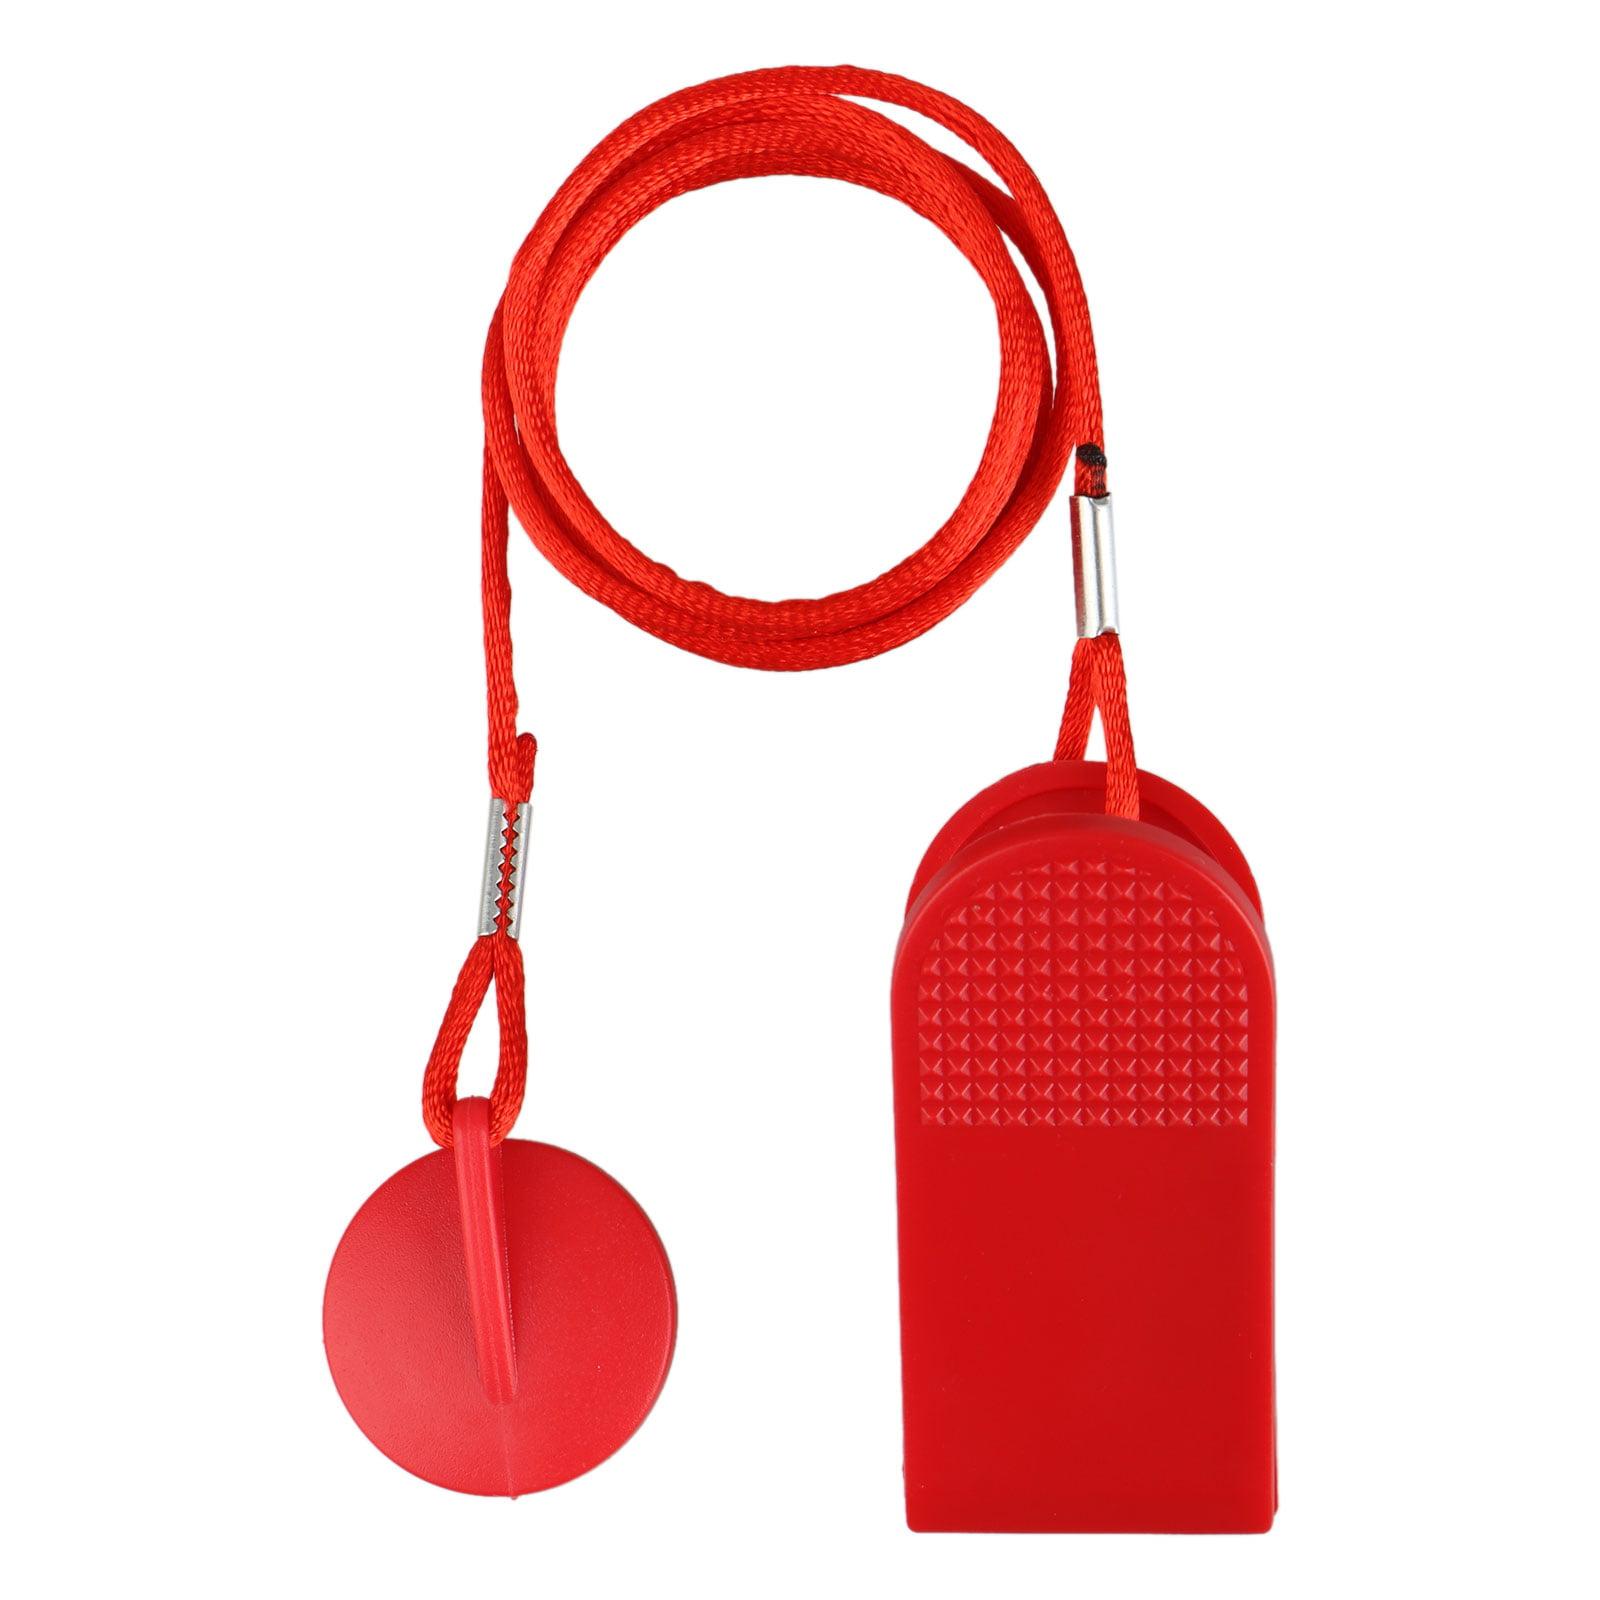 EEEkit Universal Treadmill Safety Key Security Lock for Sole, Weslo, Weider, Epic, Healthrider